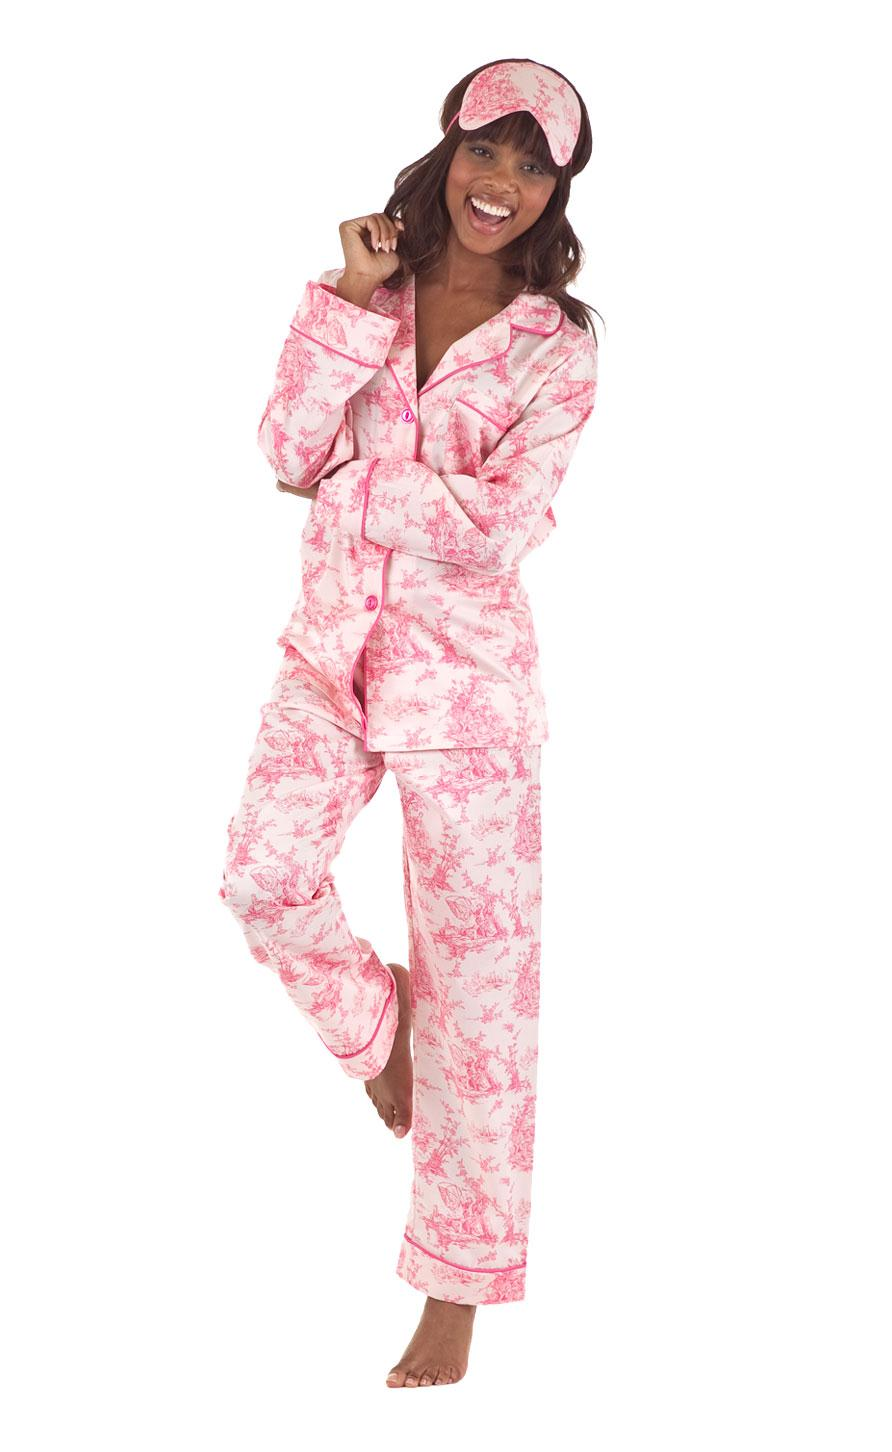 Most Comfortable Winter Pajamas